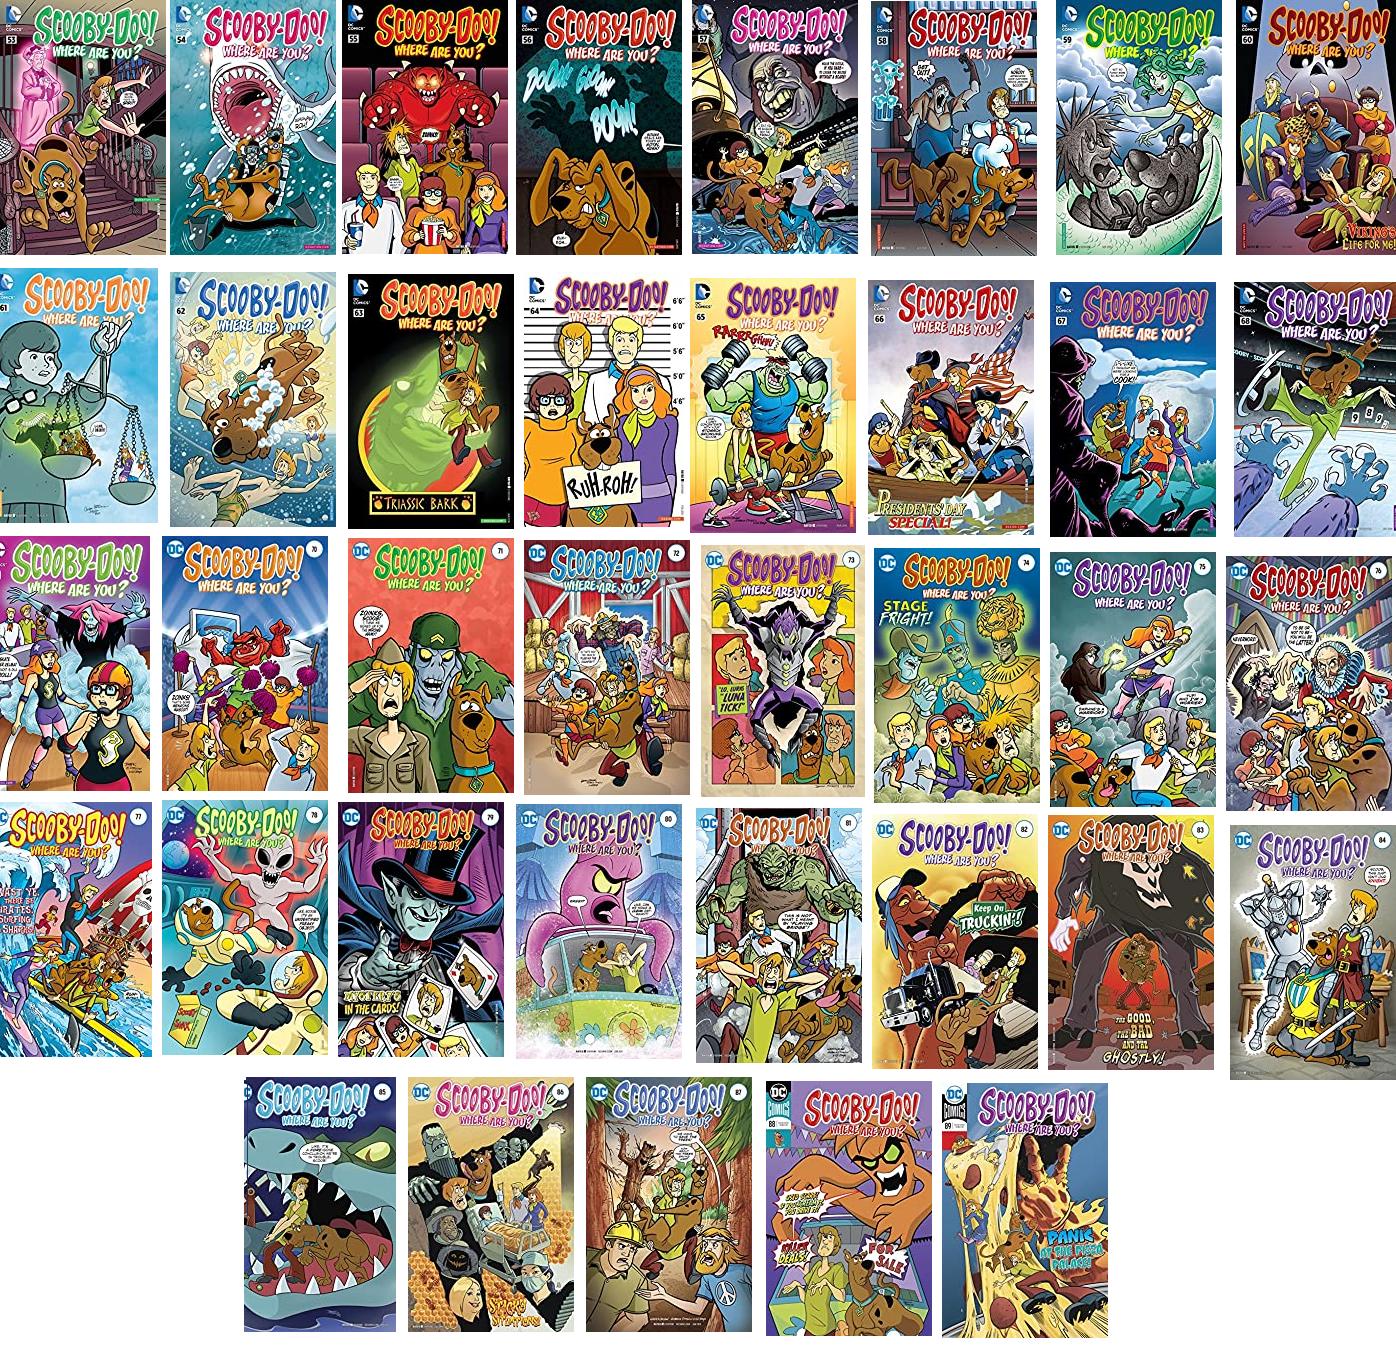 Serie de 37 Cómics: Scooby-Doo, Where Are You? (En Inglés)